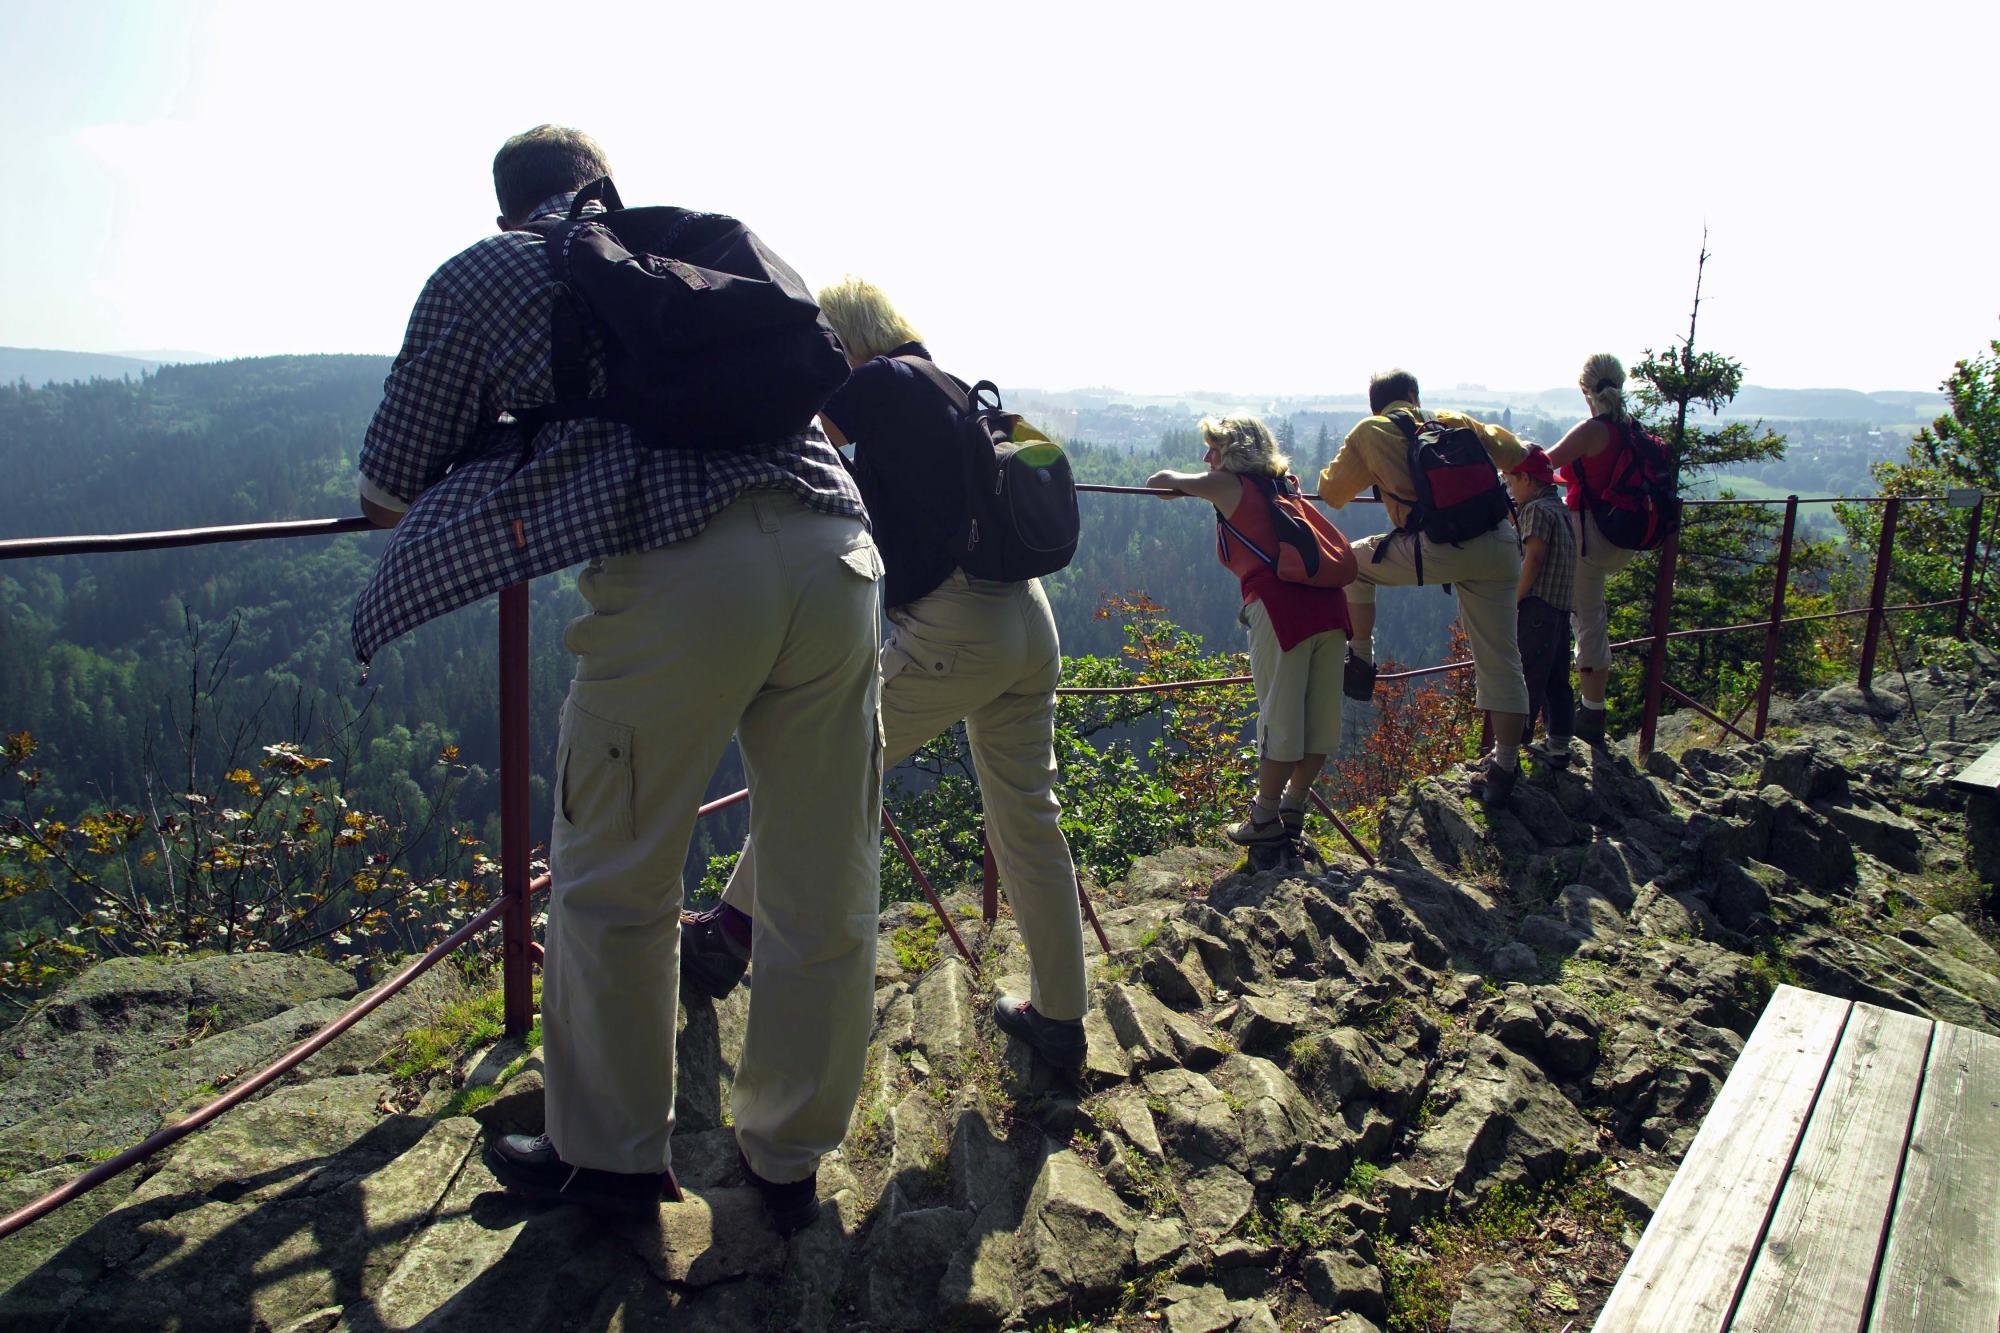 Aussichtspunkt König David über dem Höllental